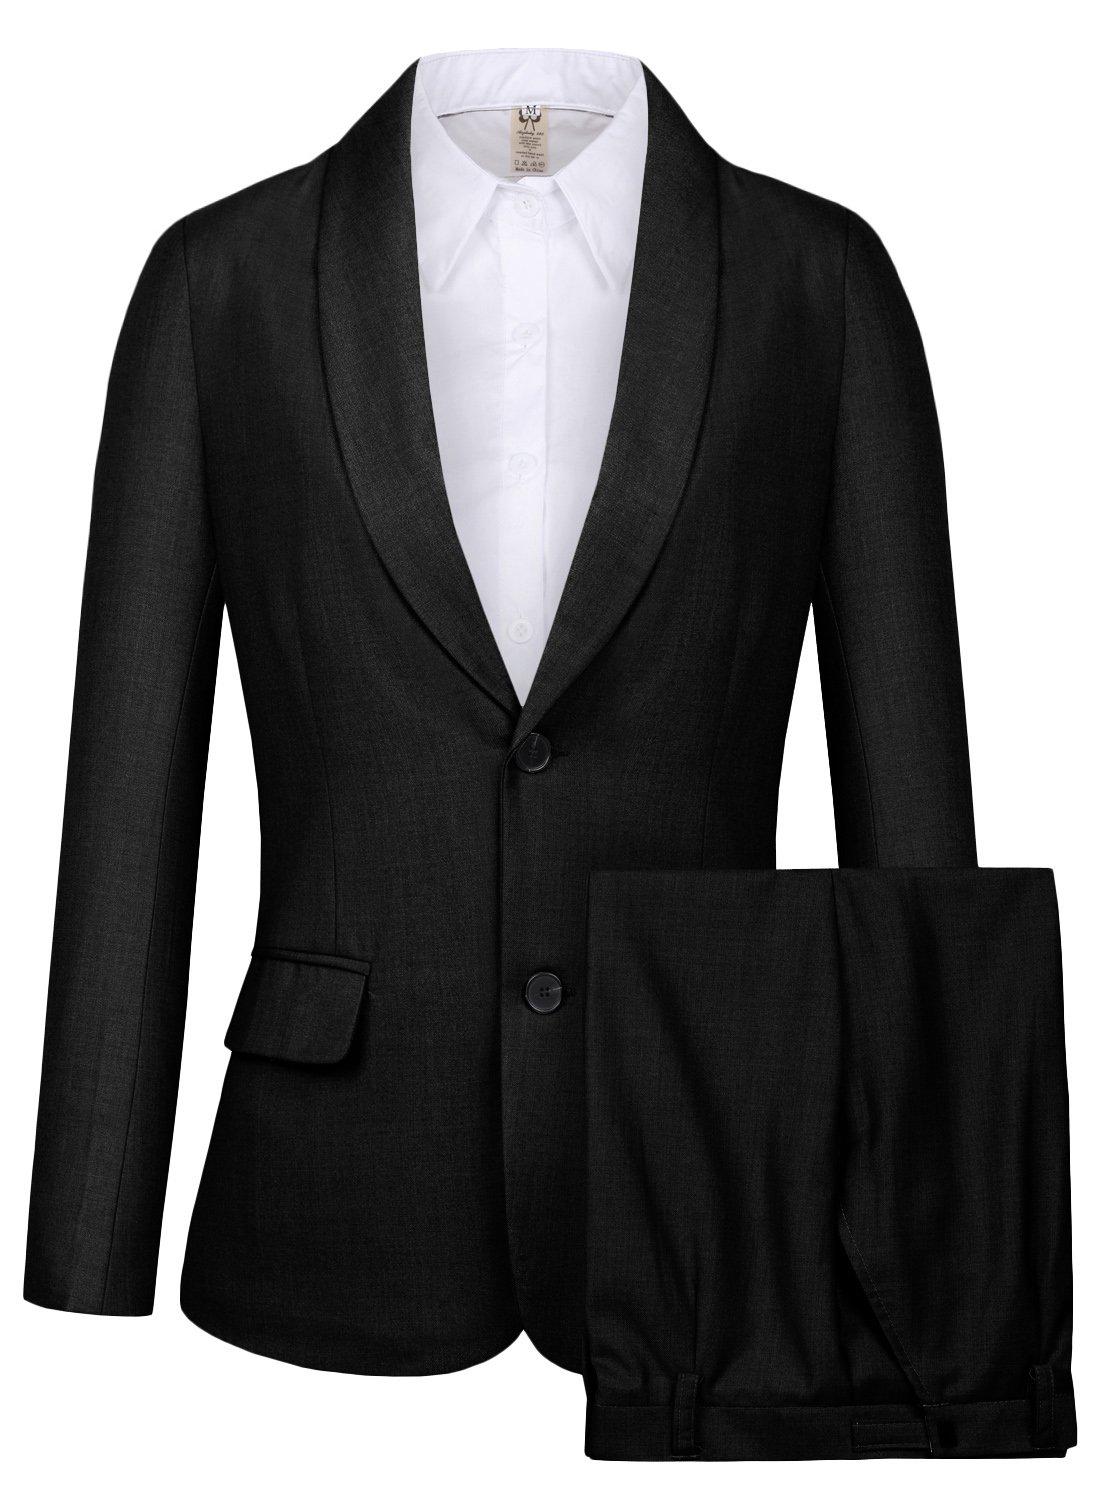 CMDC Women's 2 PC Business Casual Shawl Collar Formal Blazer Suit Pants Sets MI35 (Black, 6)